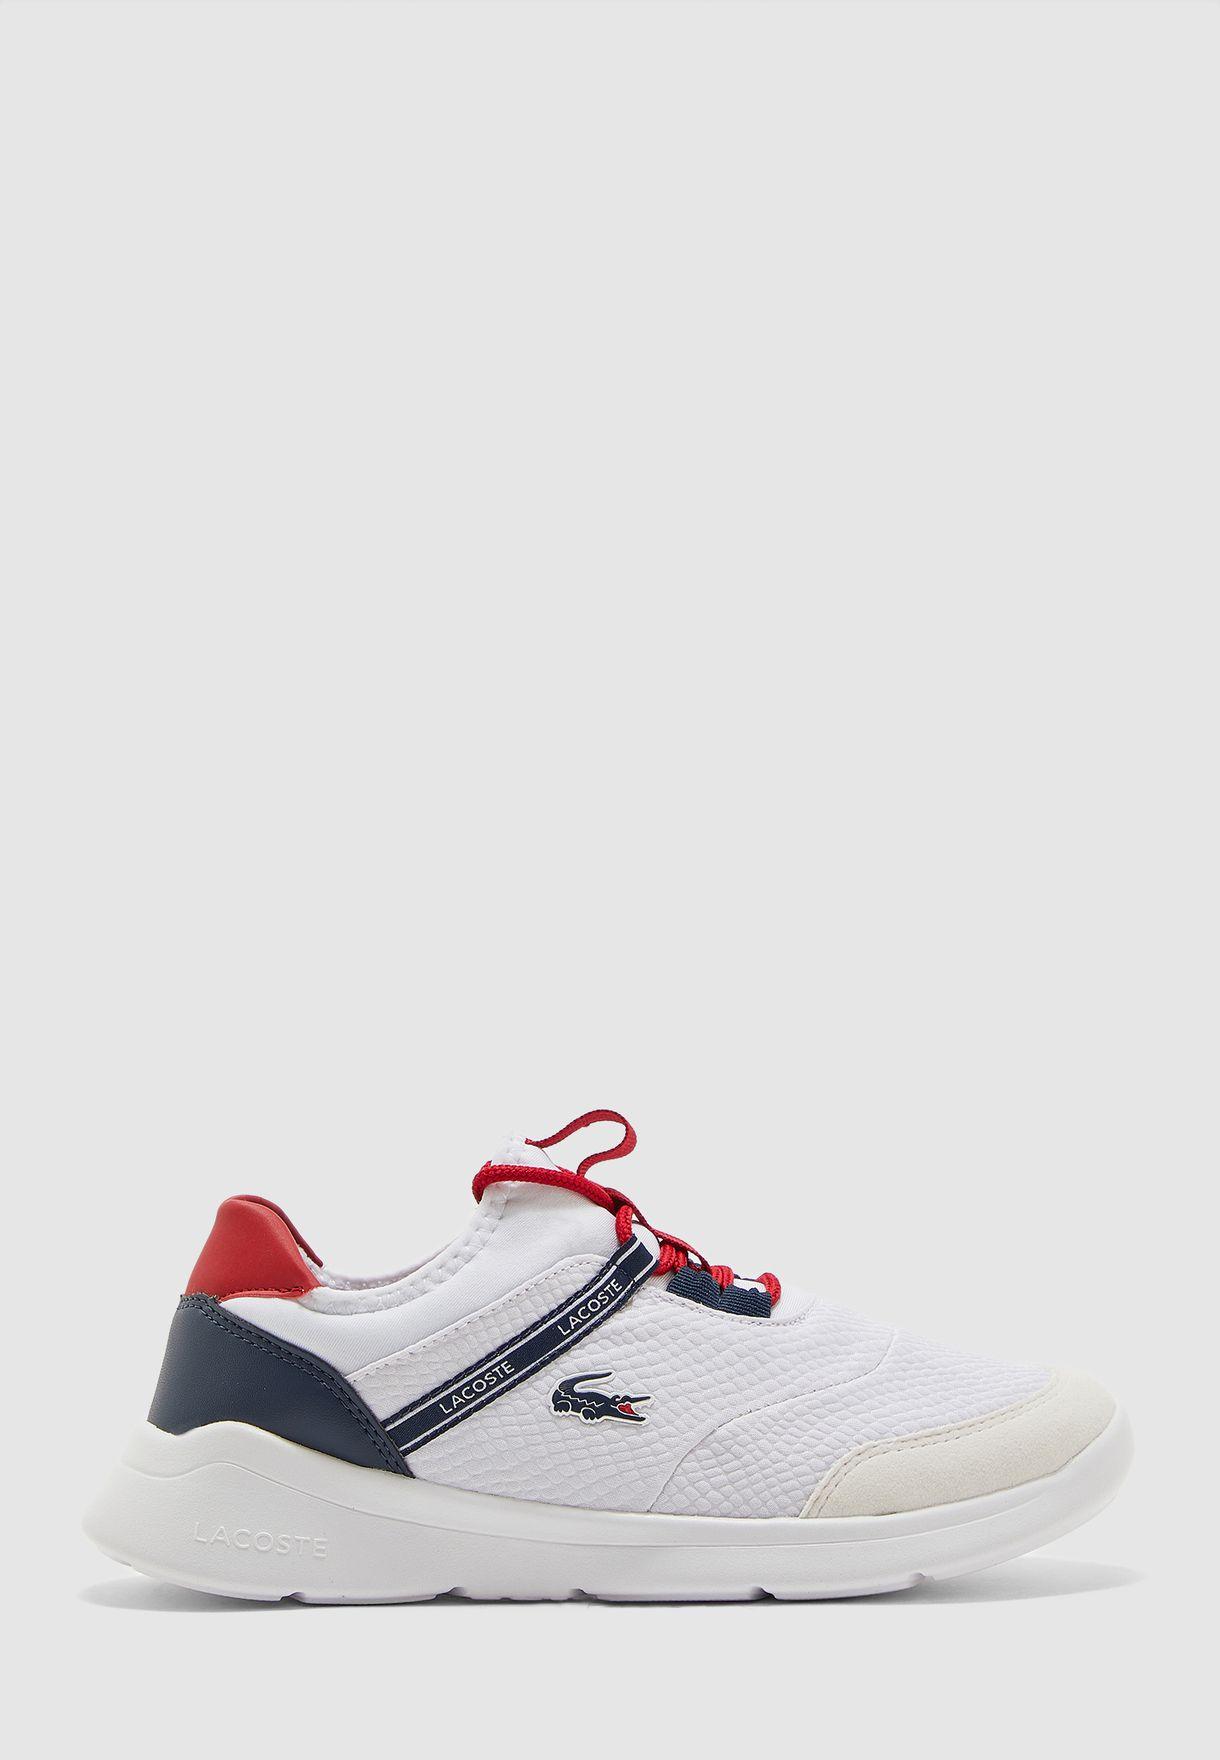 حذاء ال تي داش لو توب